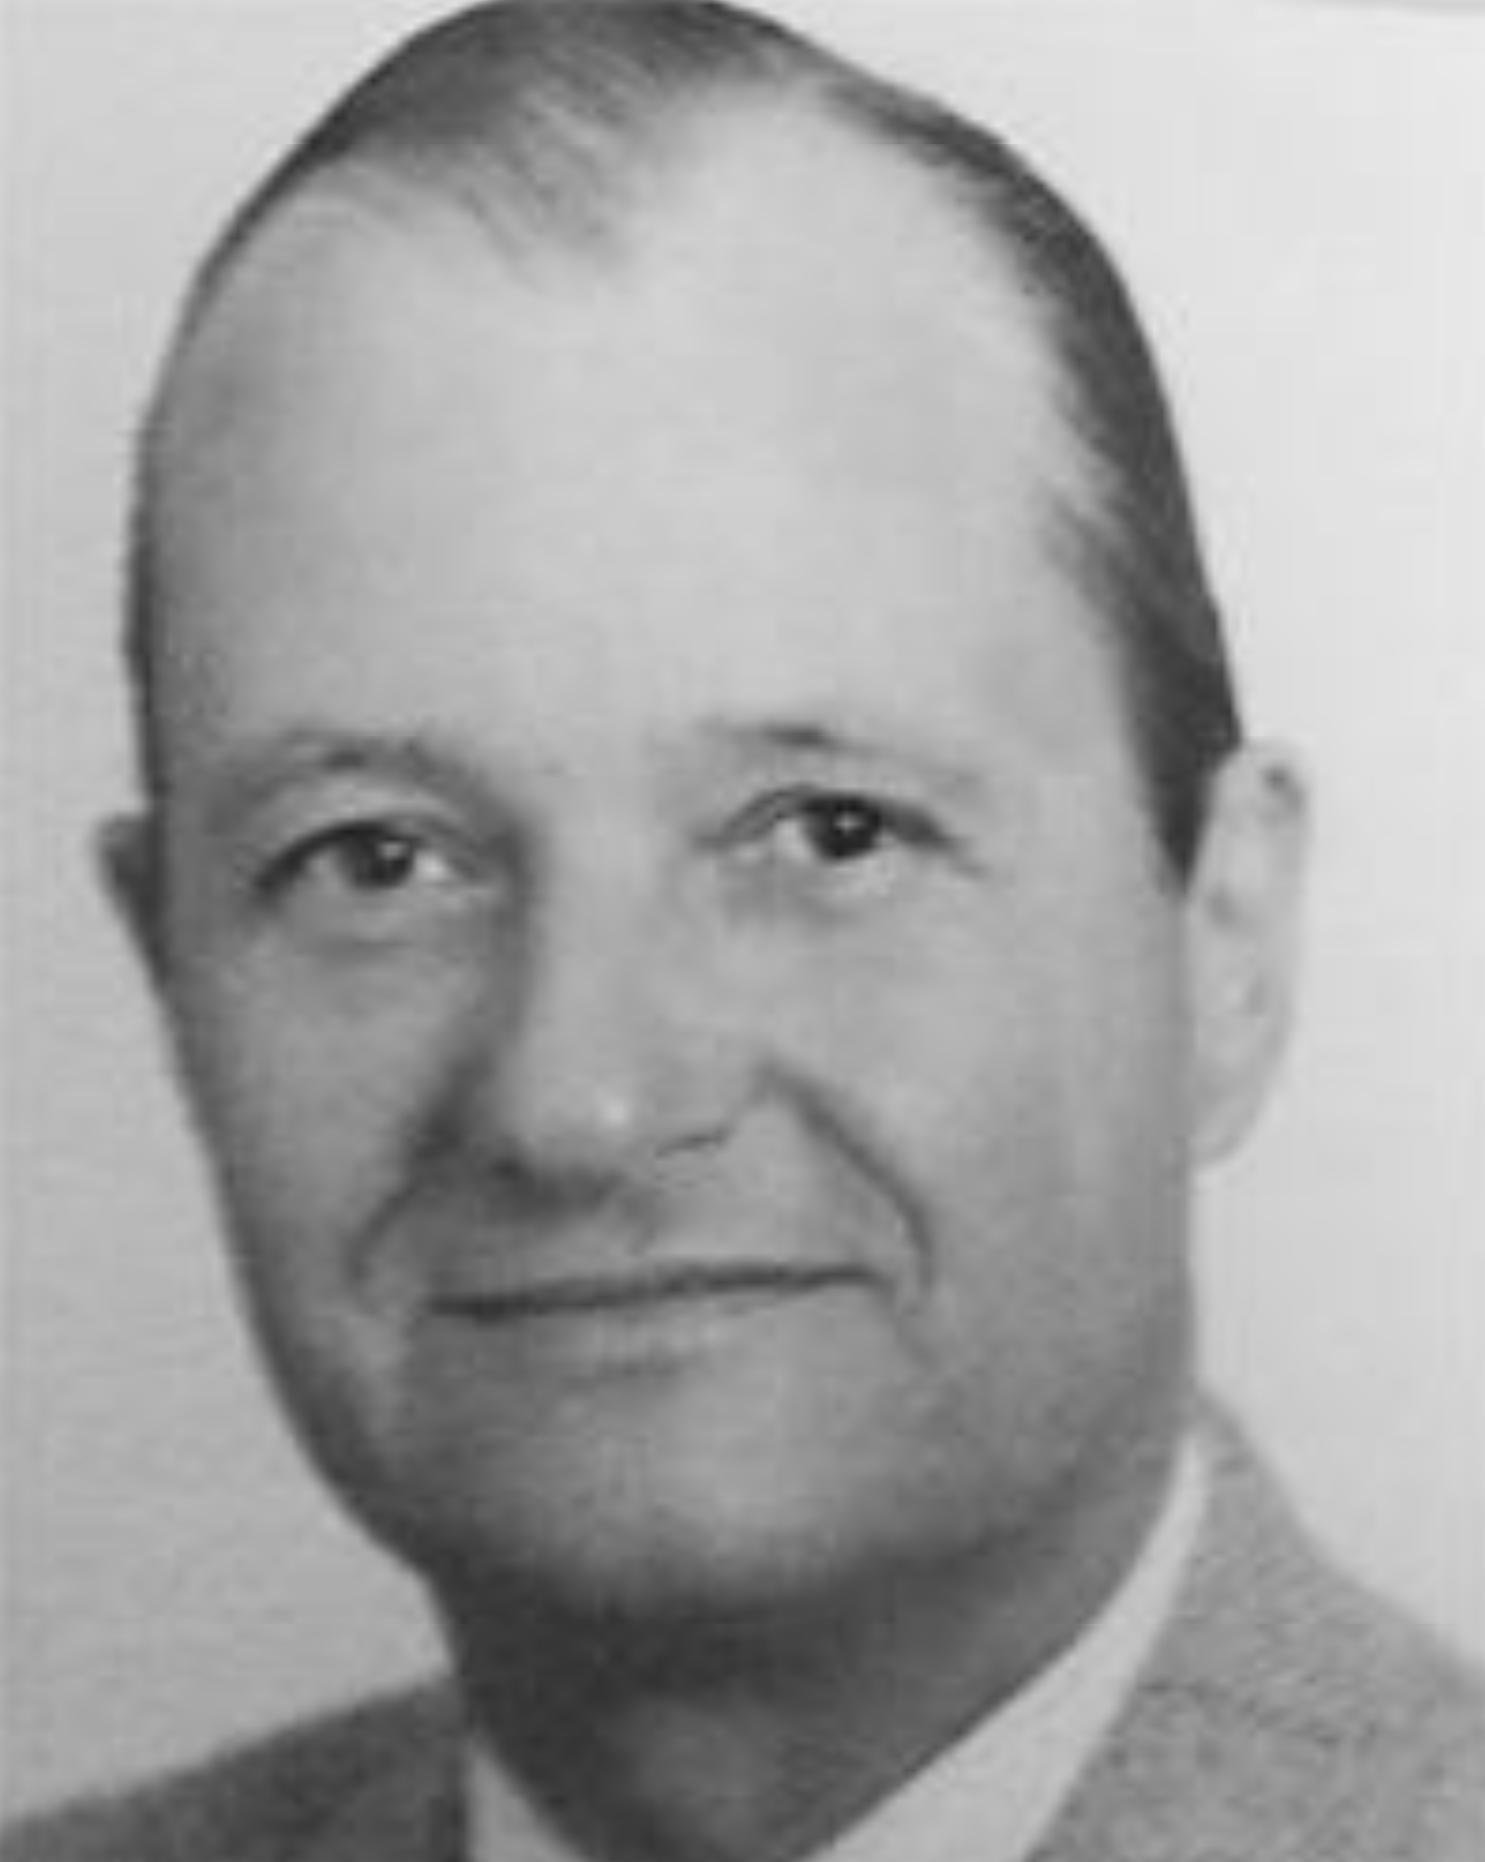 PAUL A. SEYMOUR, JR